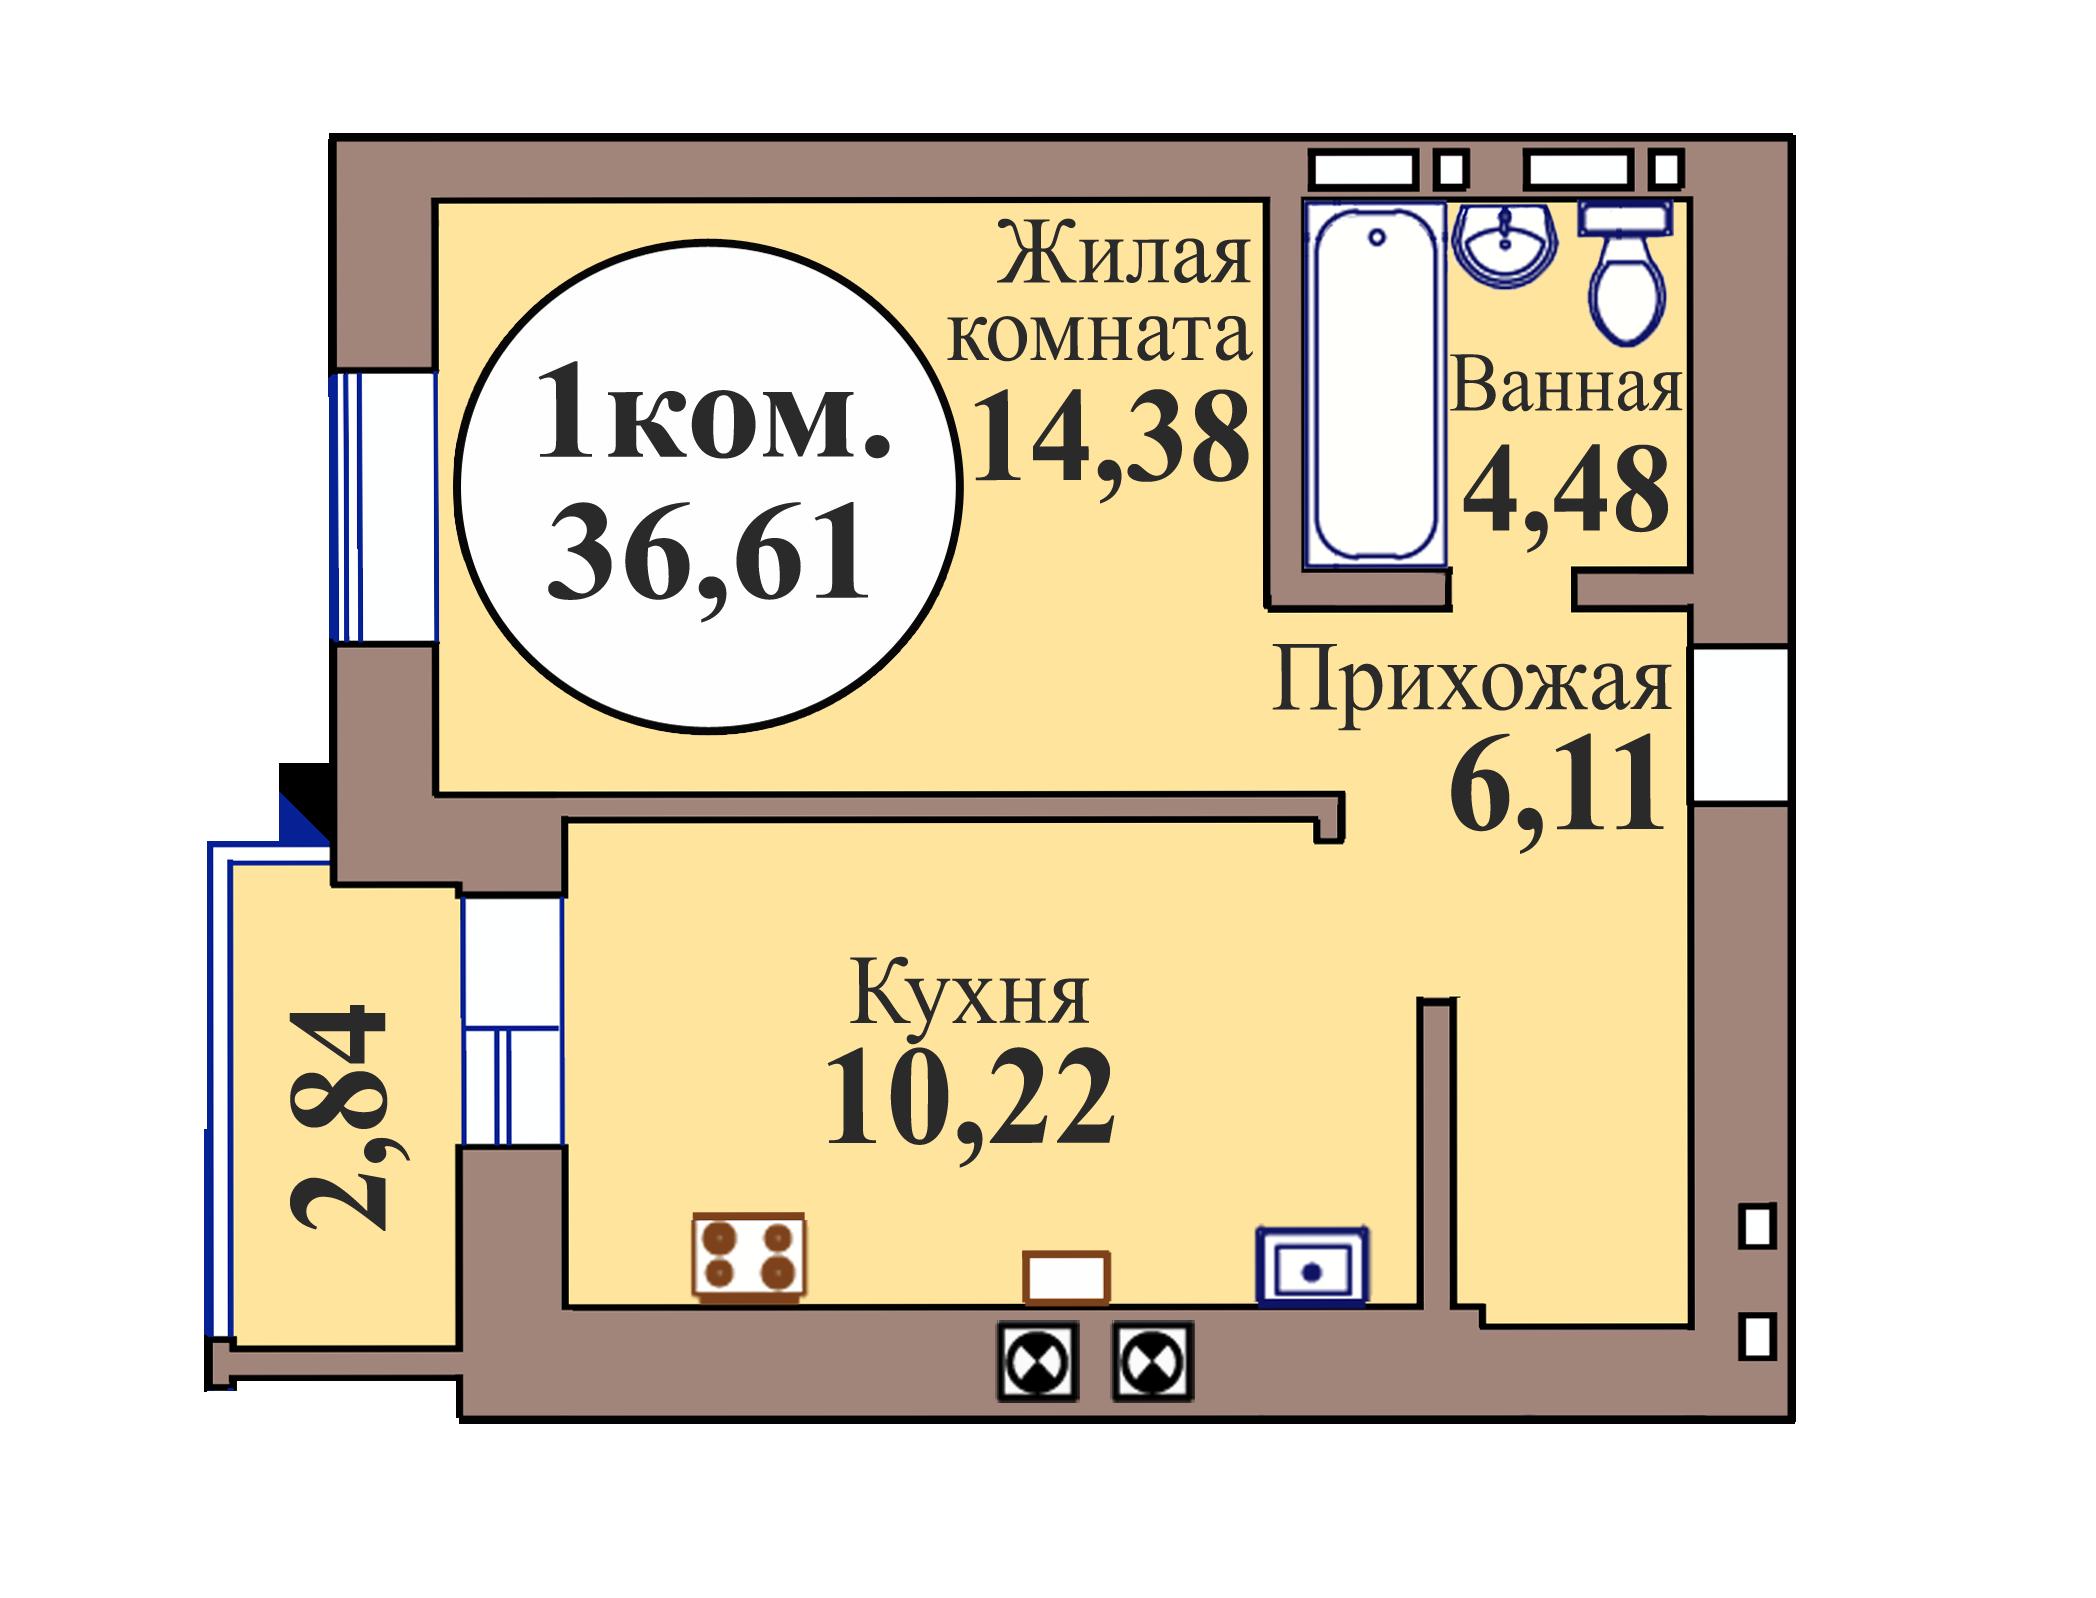 1-комн. кв. по ГП дом №3, МКР Васильково, кв. 172 в Калининграде